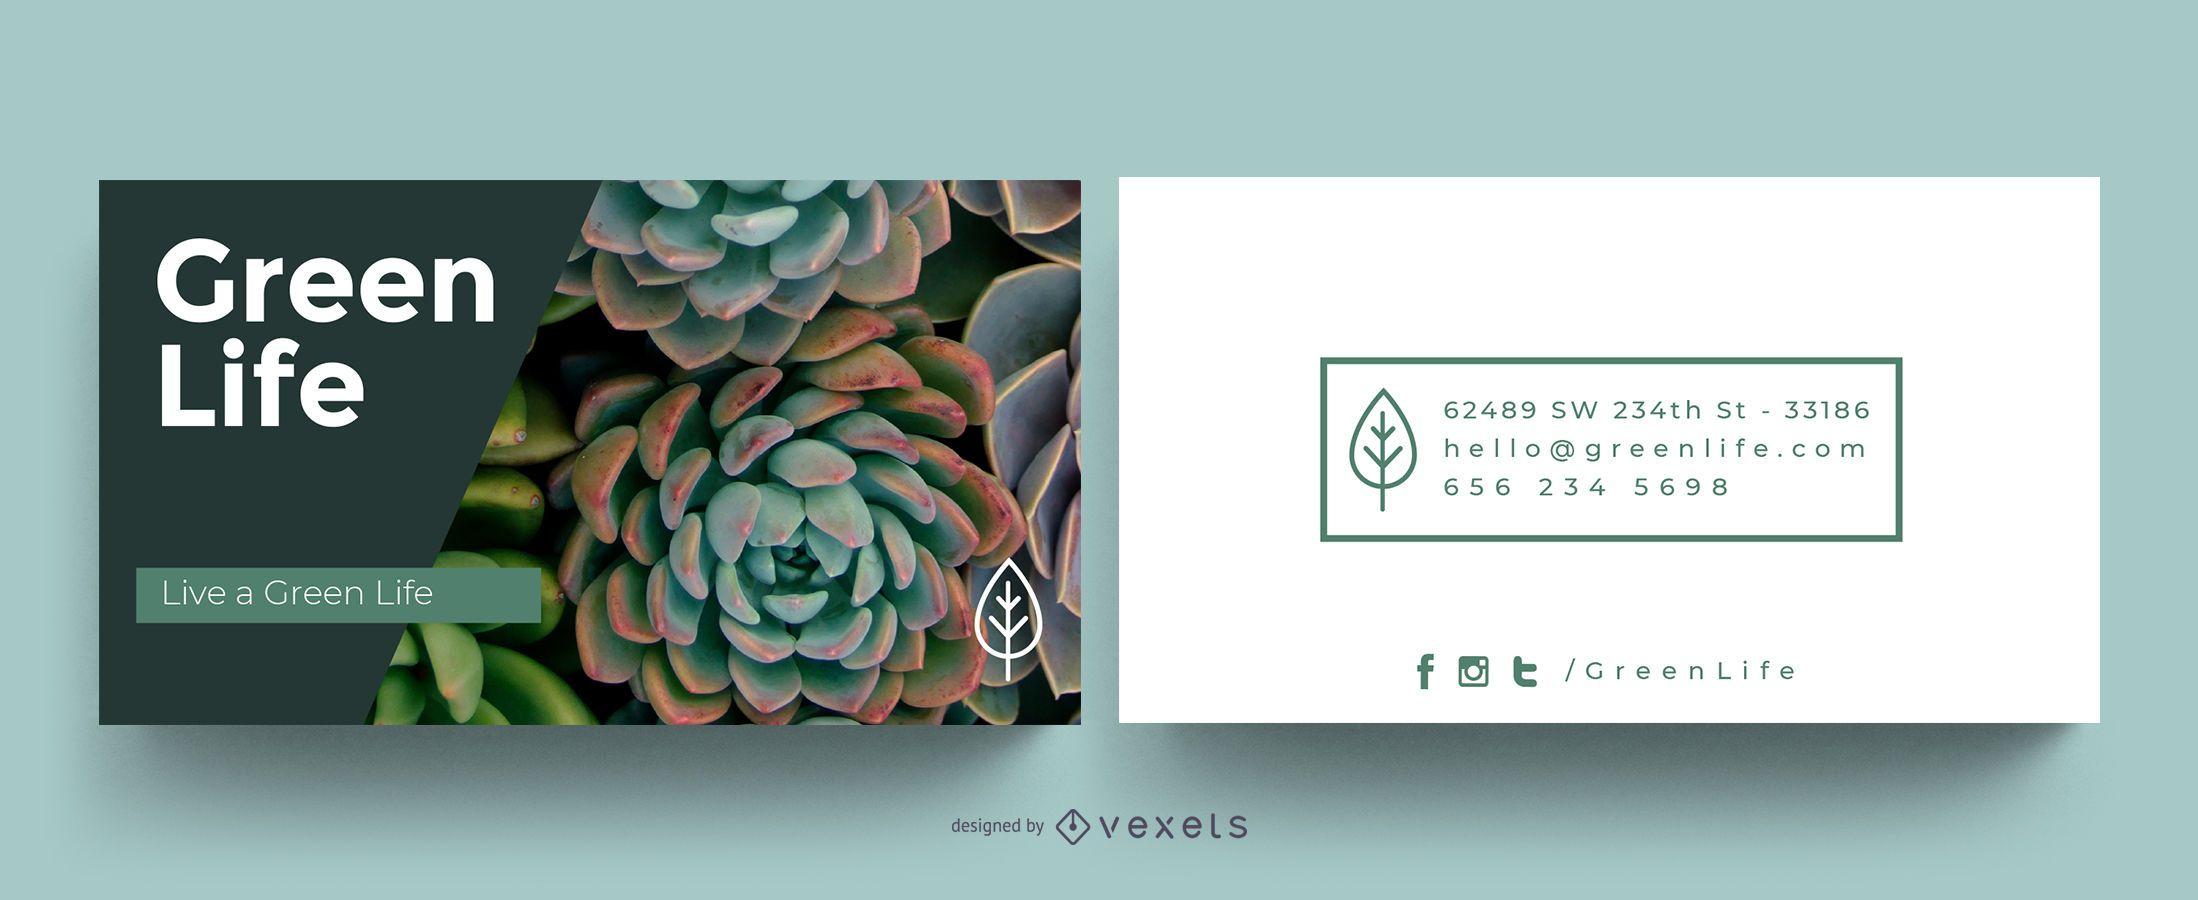 Eco green business card design